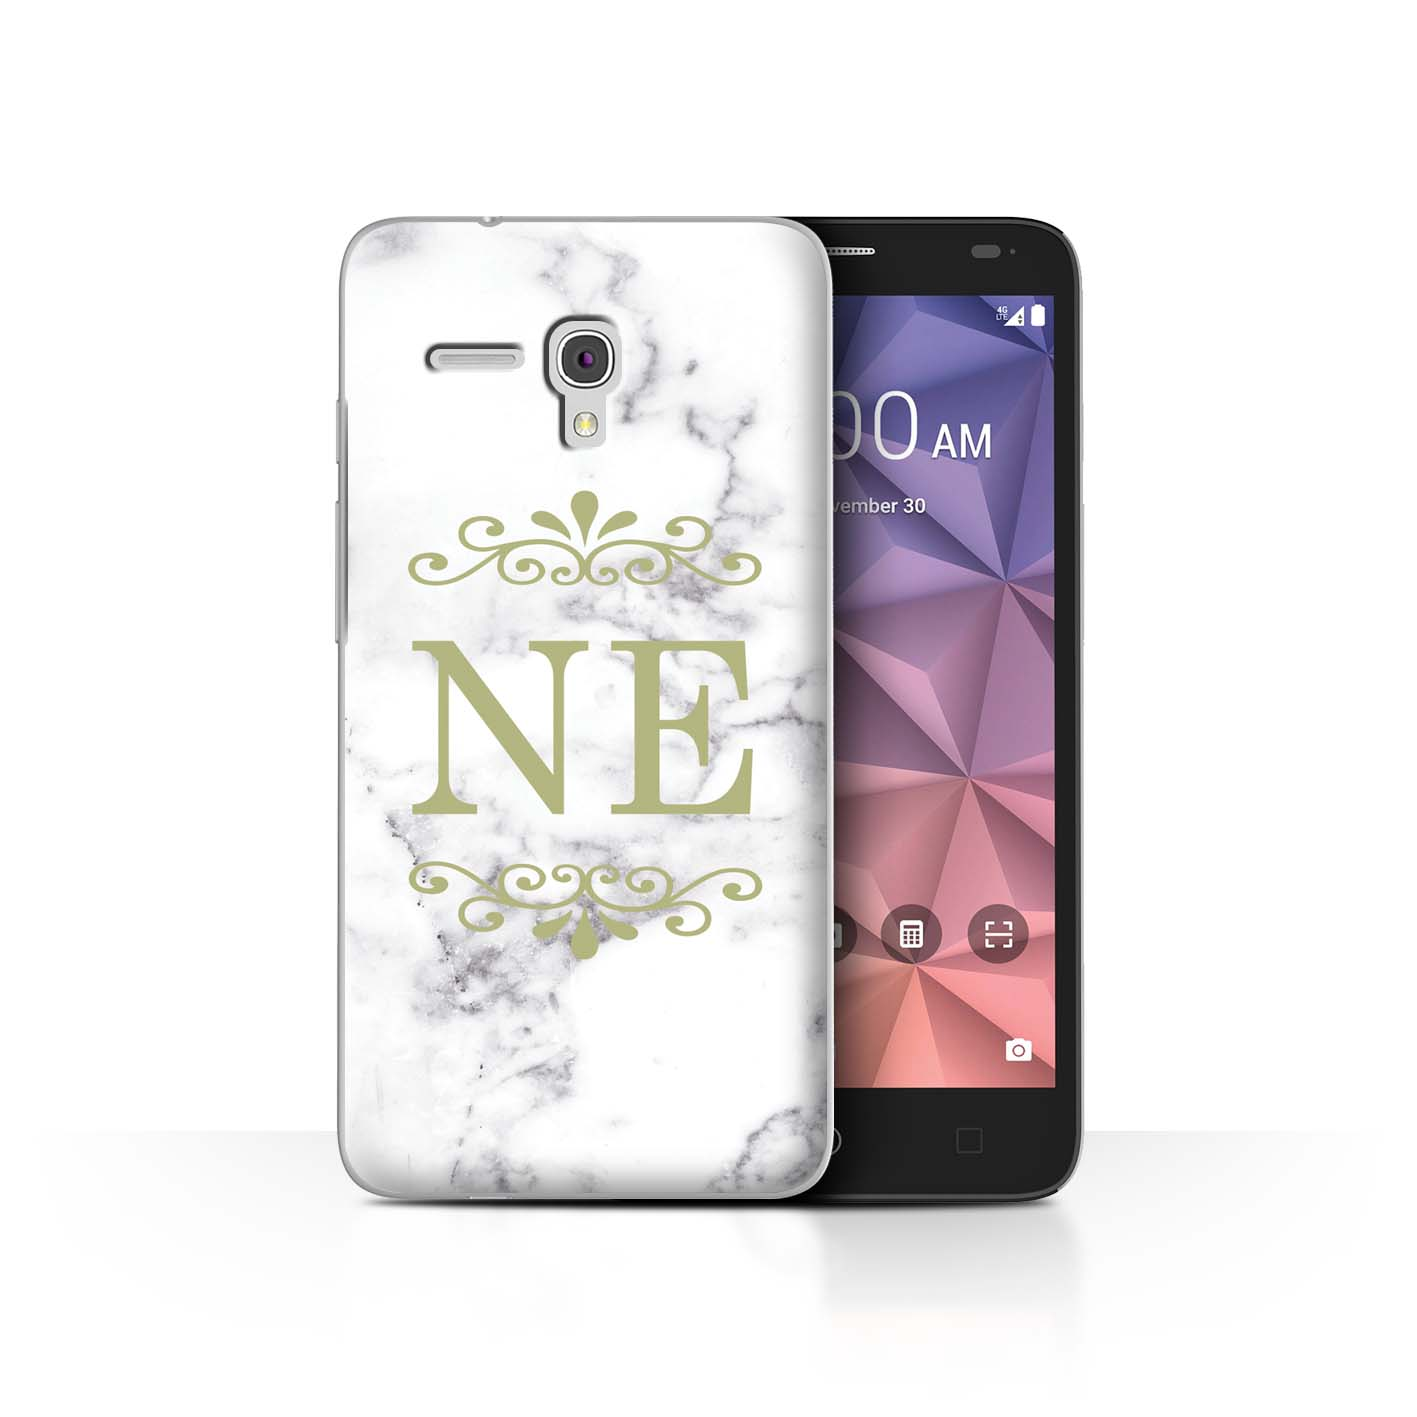 Personnalise-Mode-Marbre-Blanc-Coque-Etui-pour-Alcatel-Smartphone-Initiales